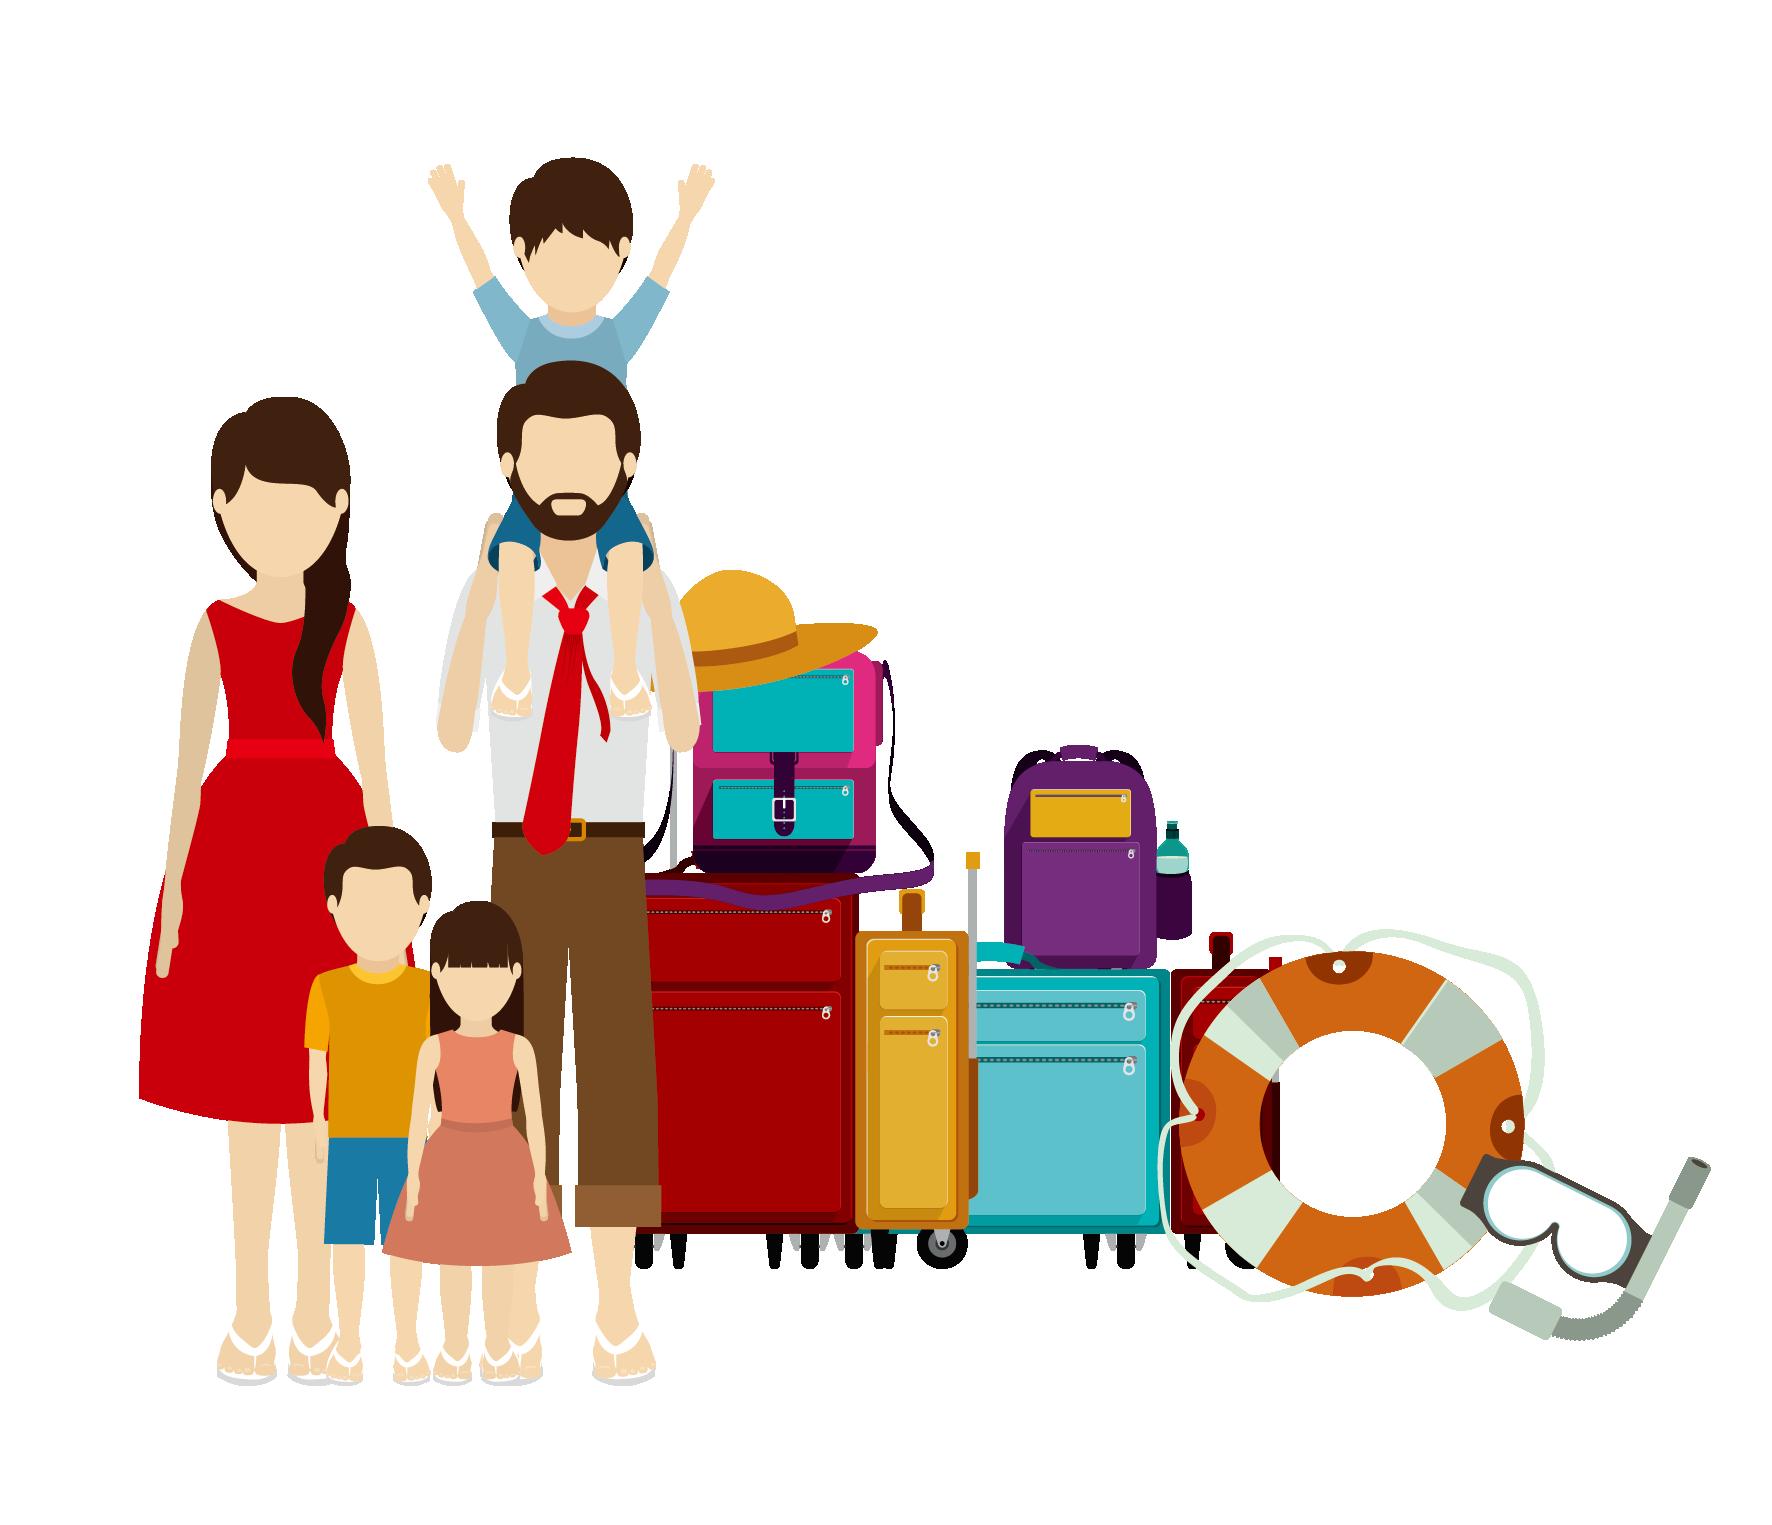 Travel illustration transprent png. Conversation clipart family conversation